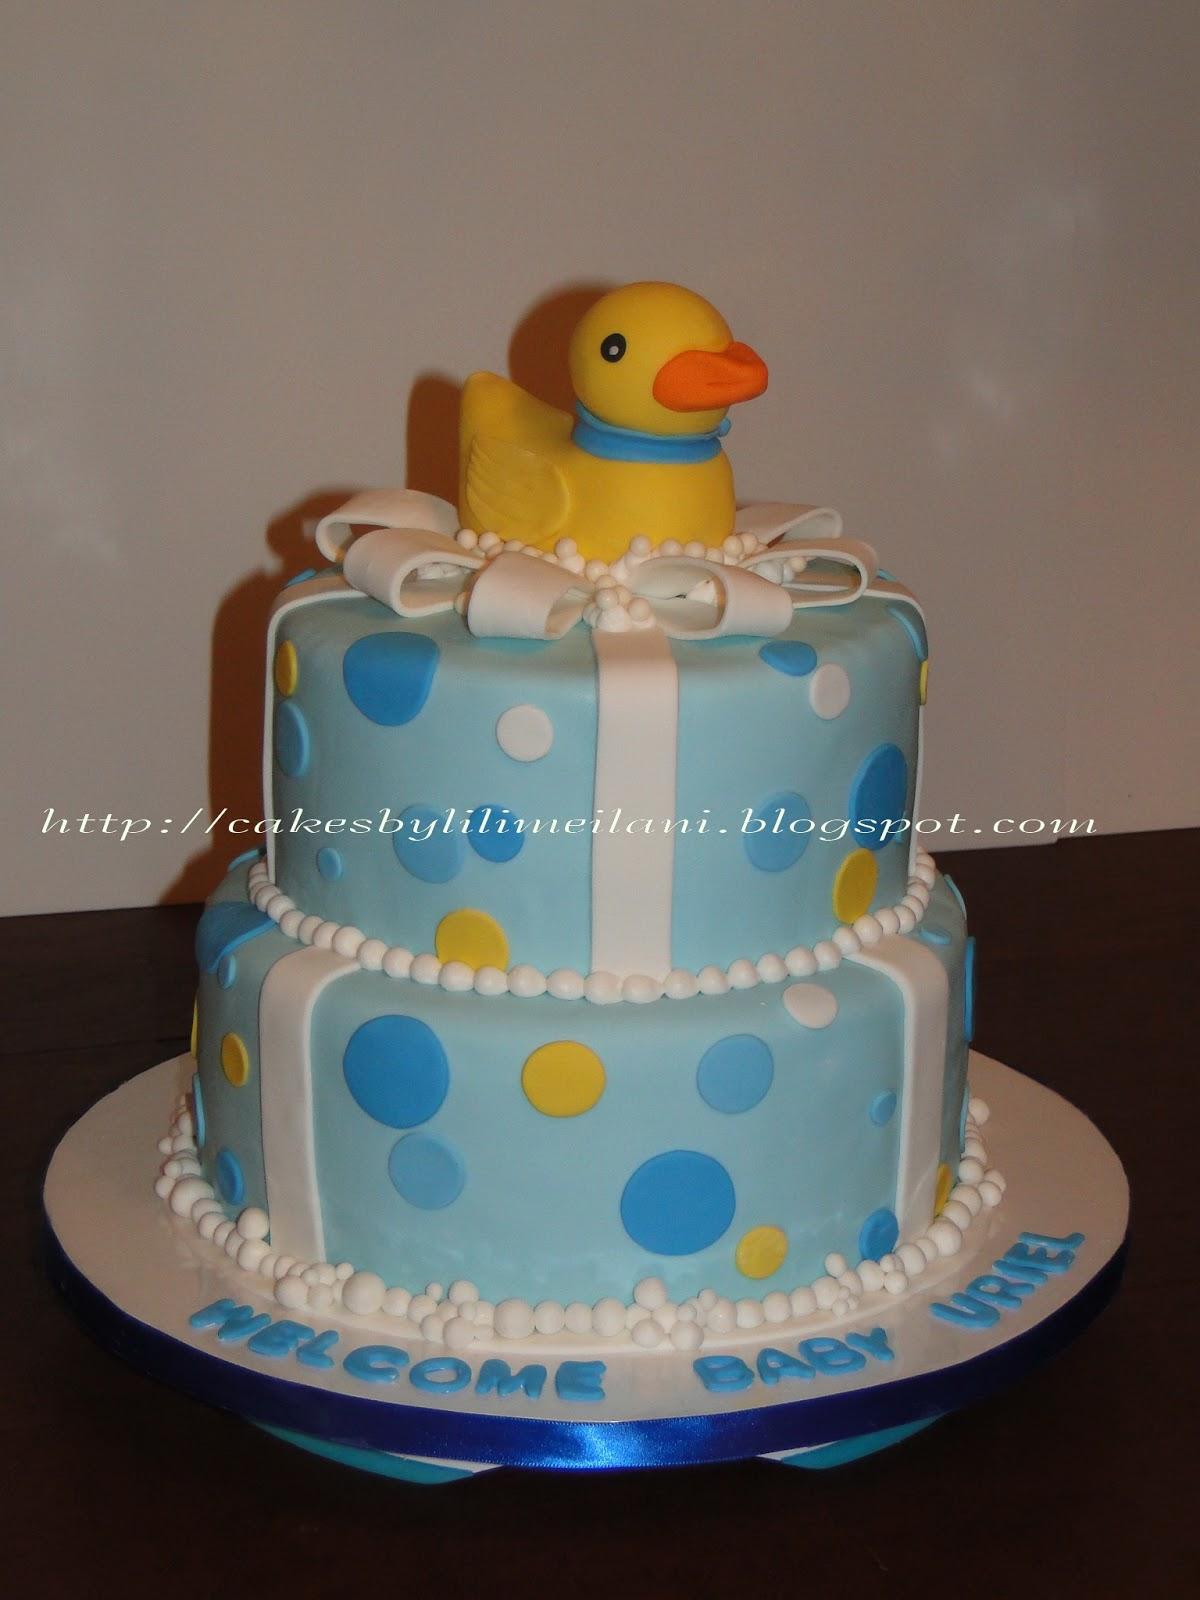 pin rubber ducky themed baby shower cake cake on pinterest